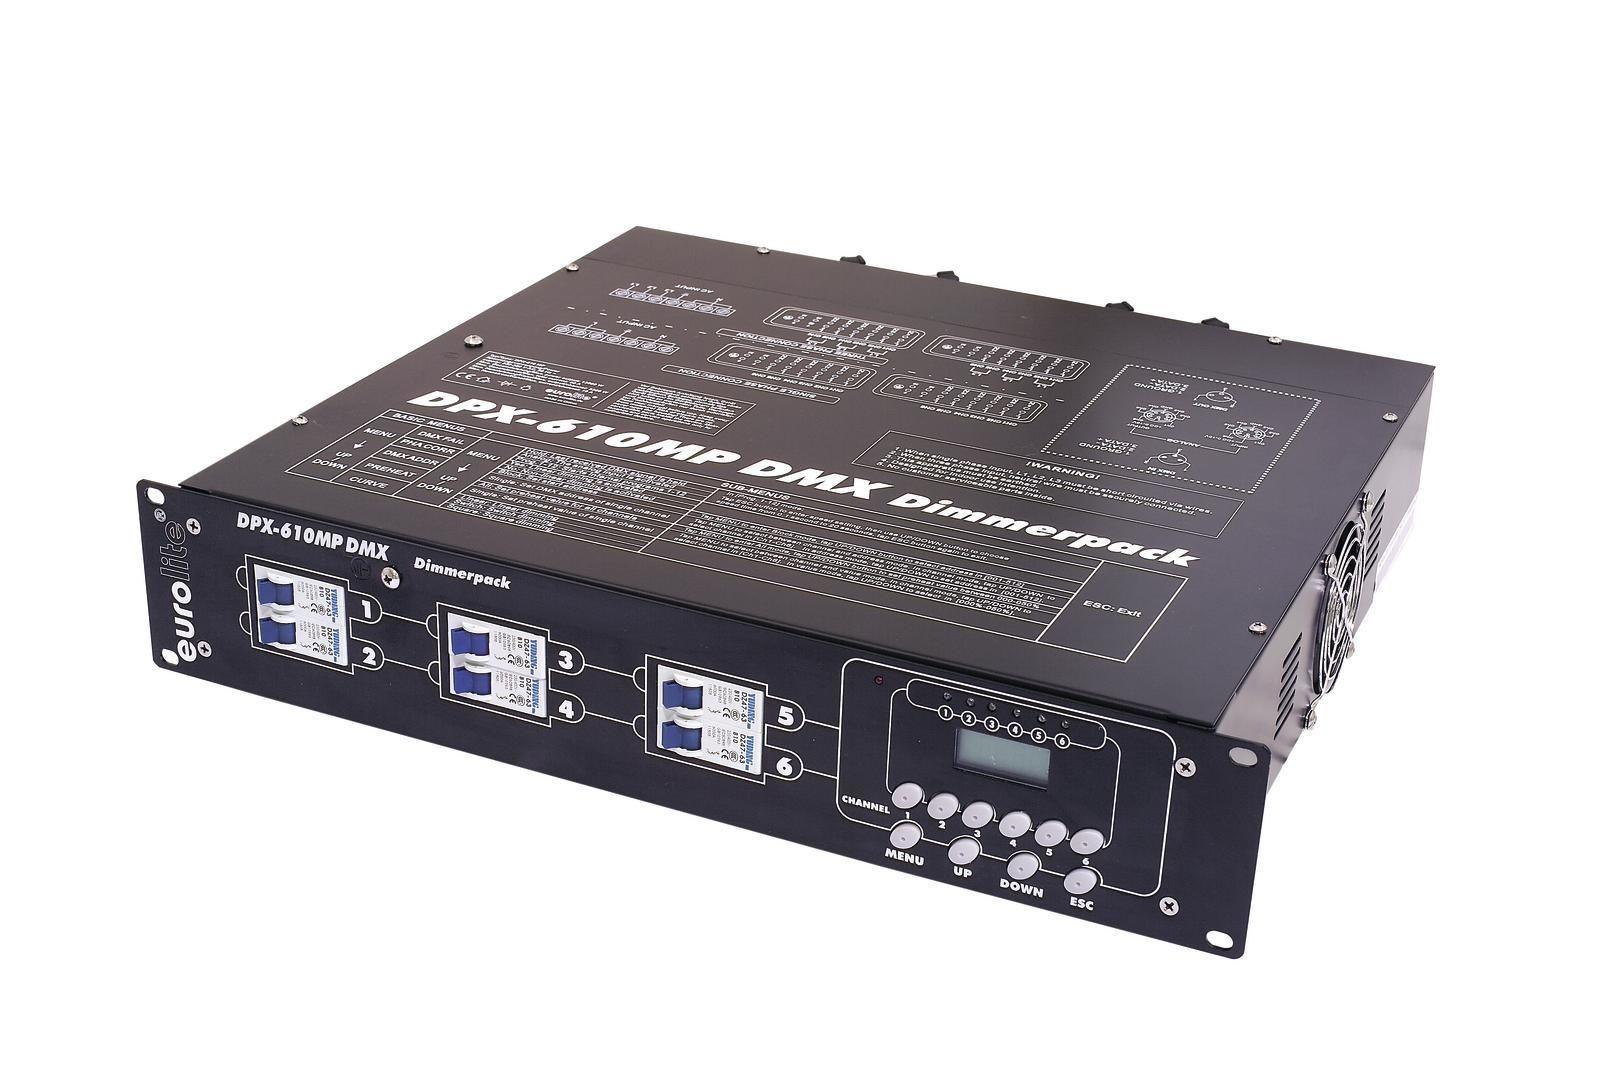 EUROLITE DPX 610 MP DMX Dimmerpack